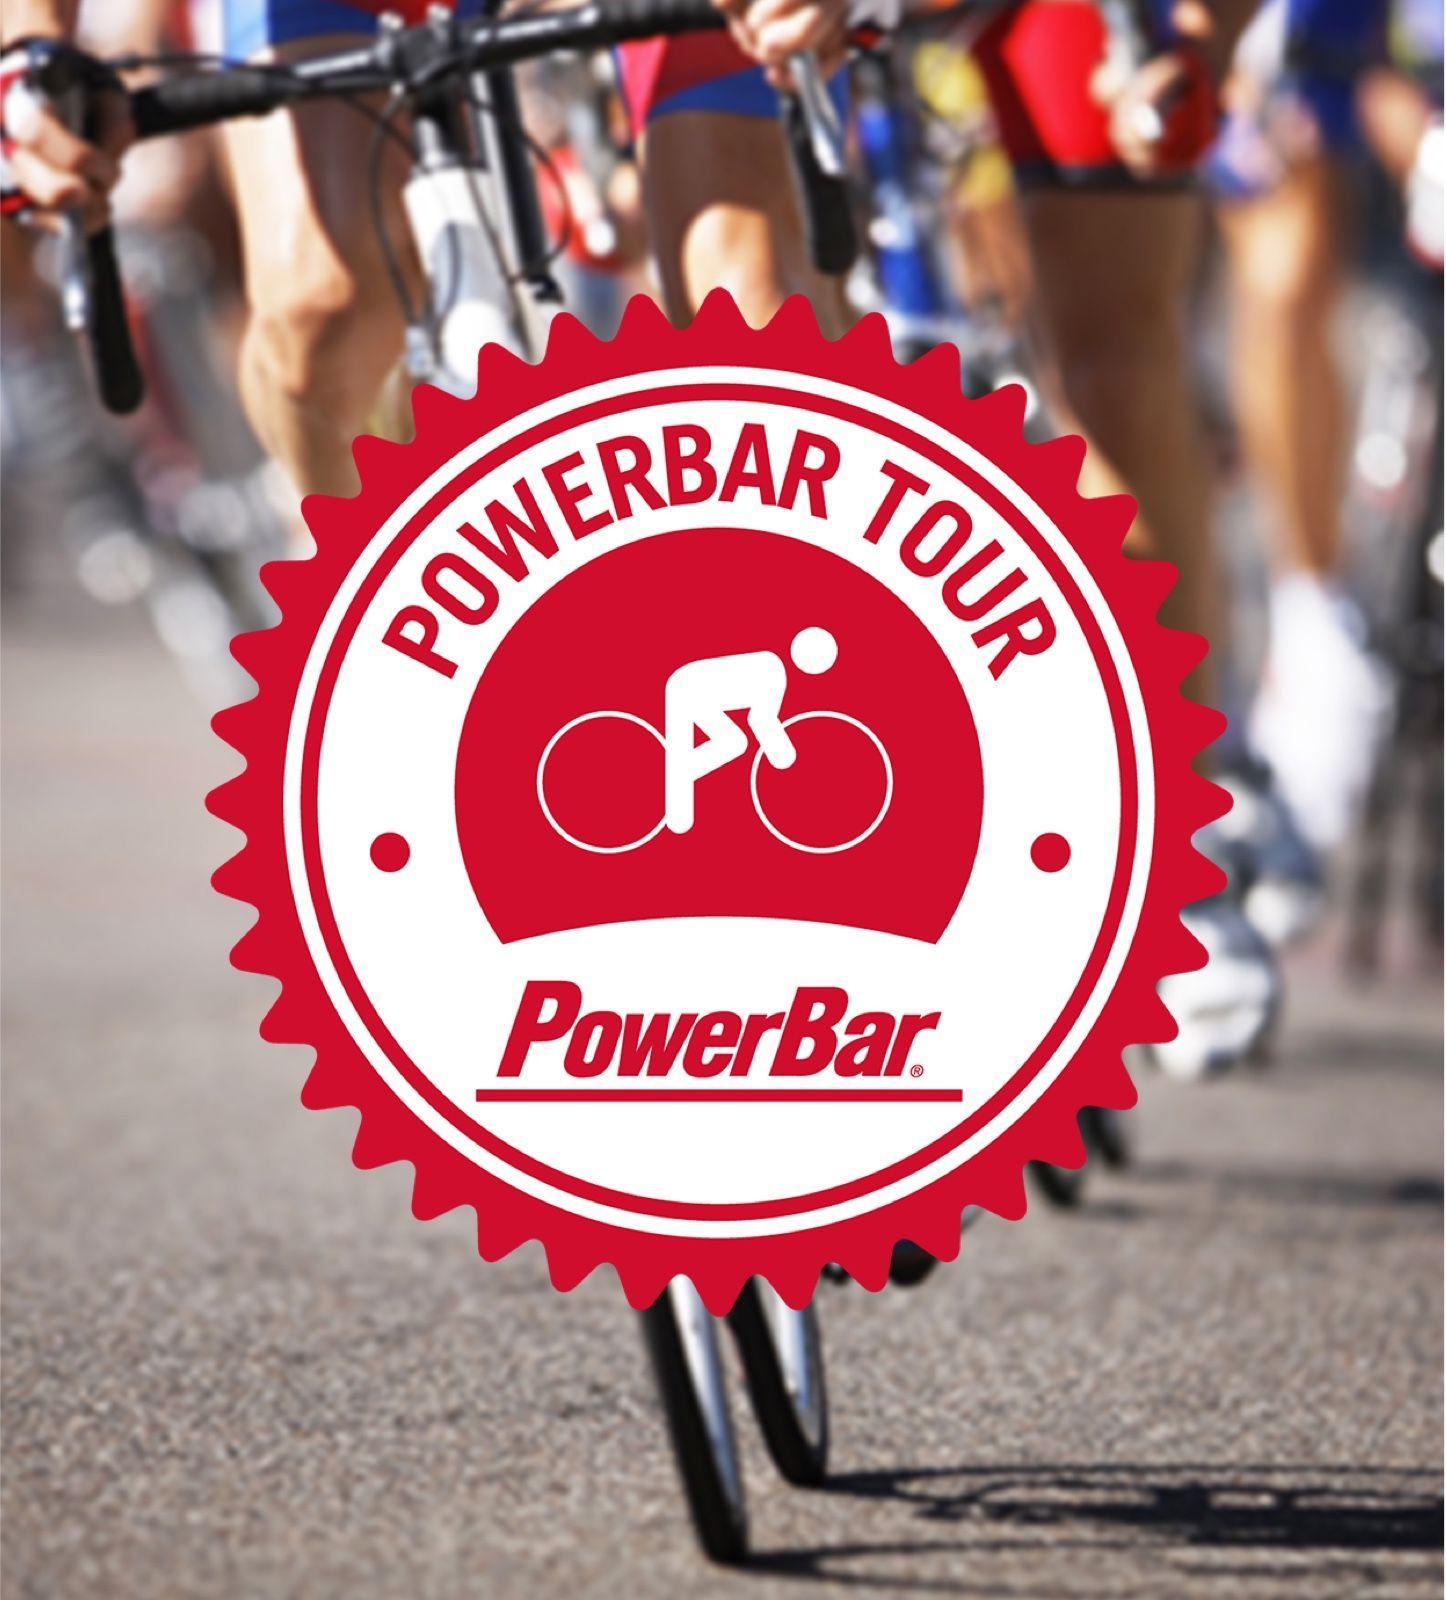 Powerbar ED Web 1 2 compressor